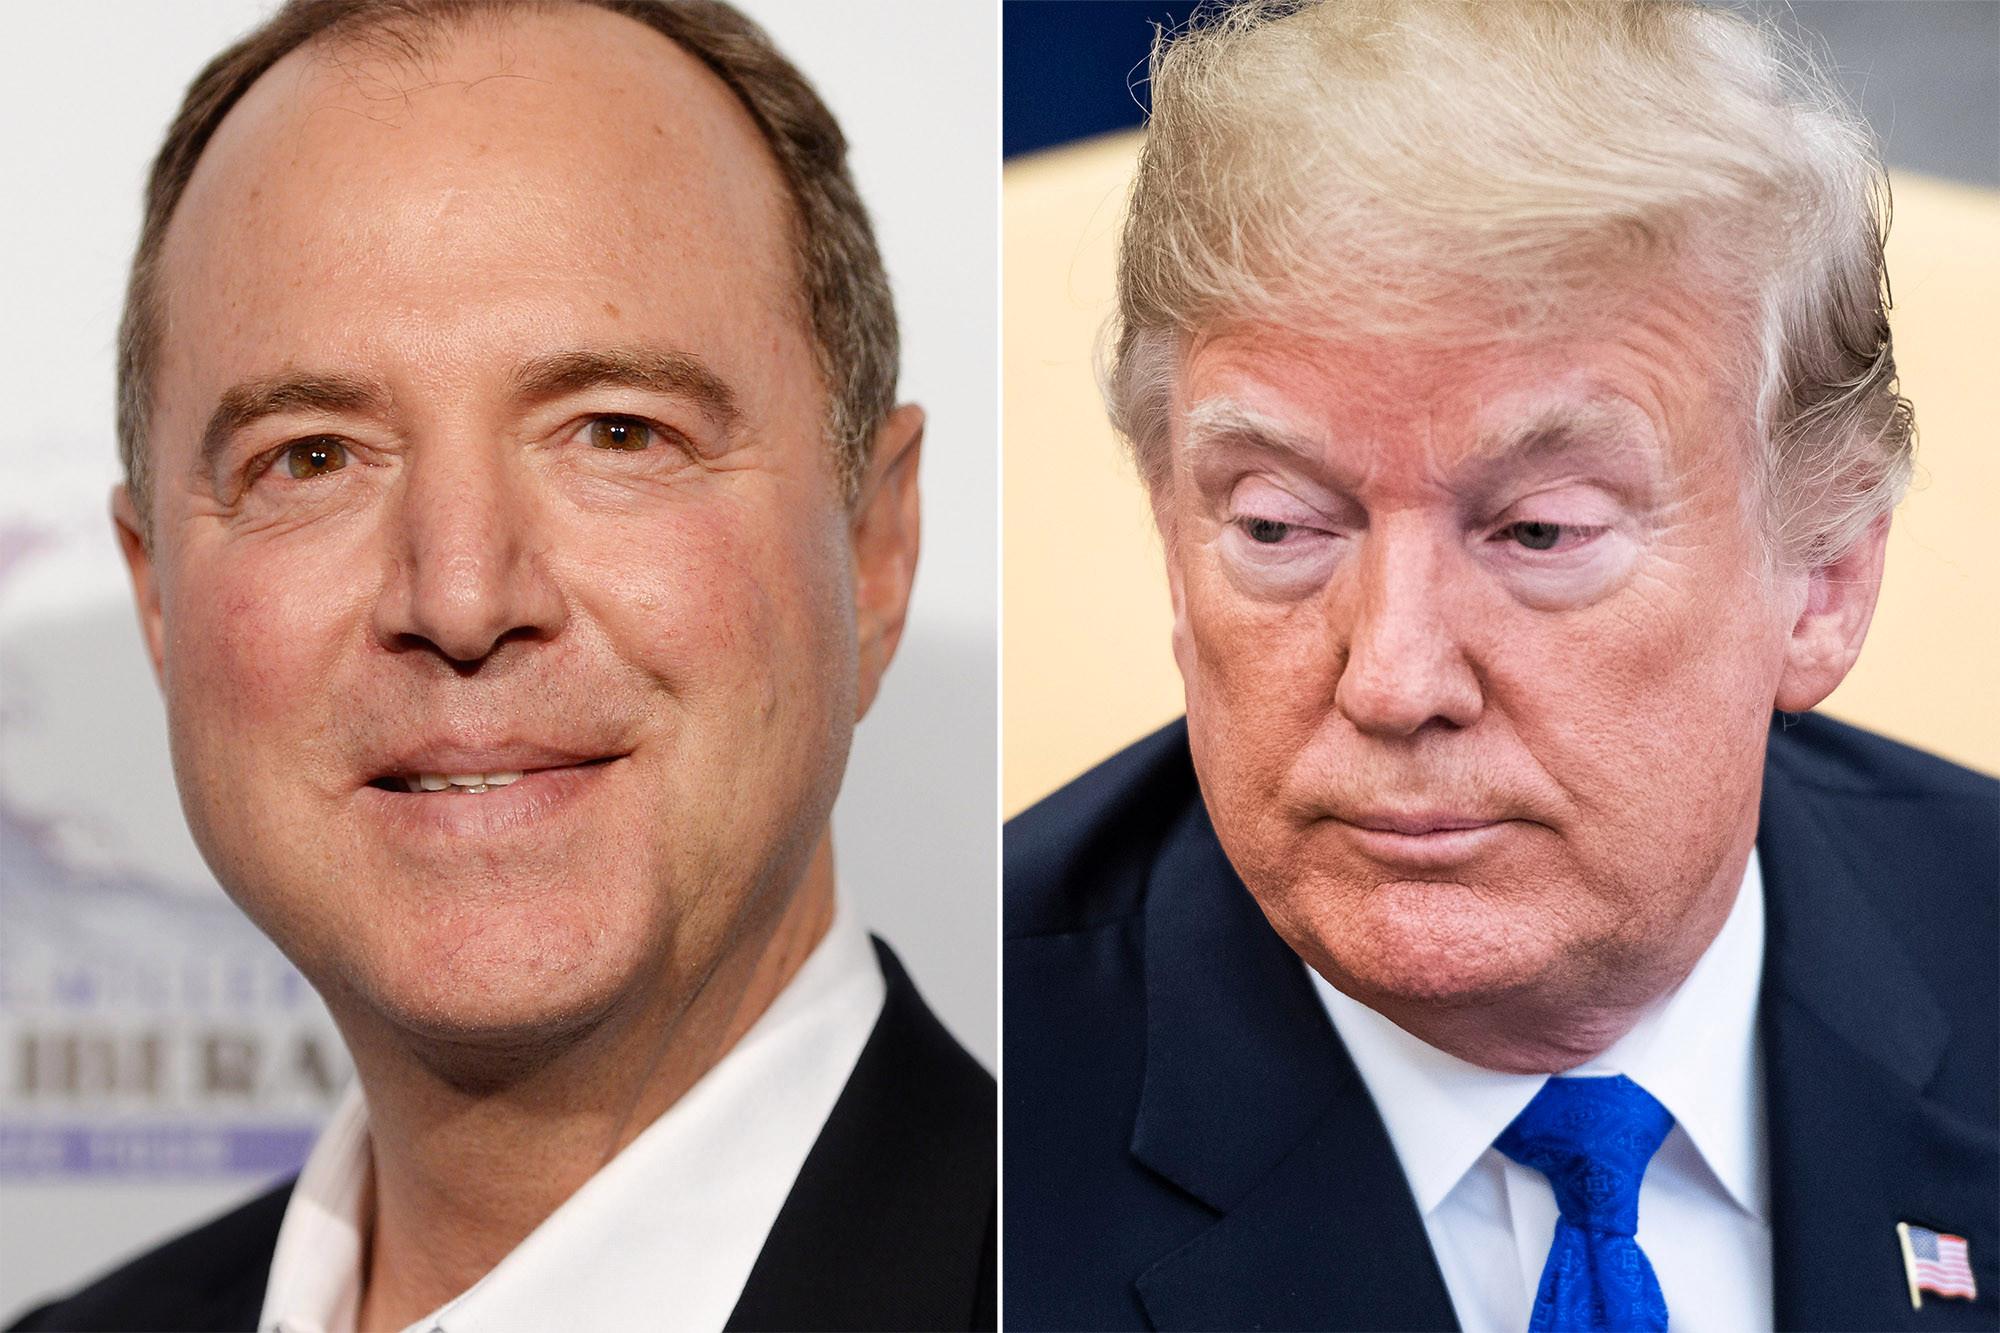 Adam Schiff threatens to probe Donald Trump's personal finances